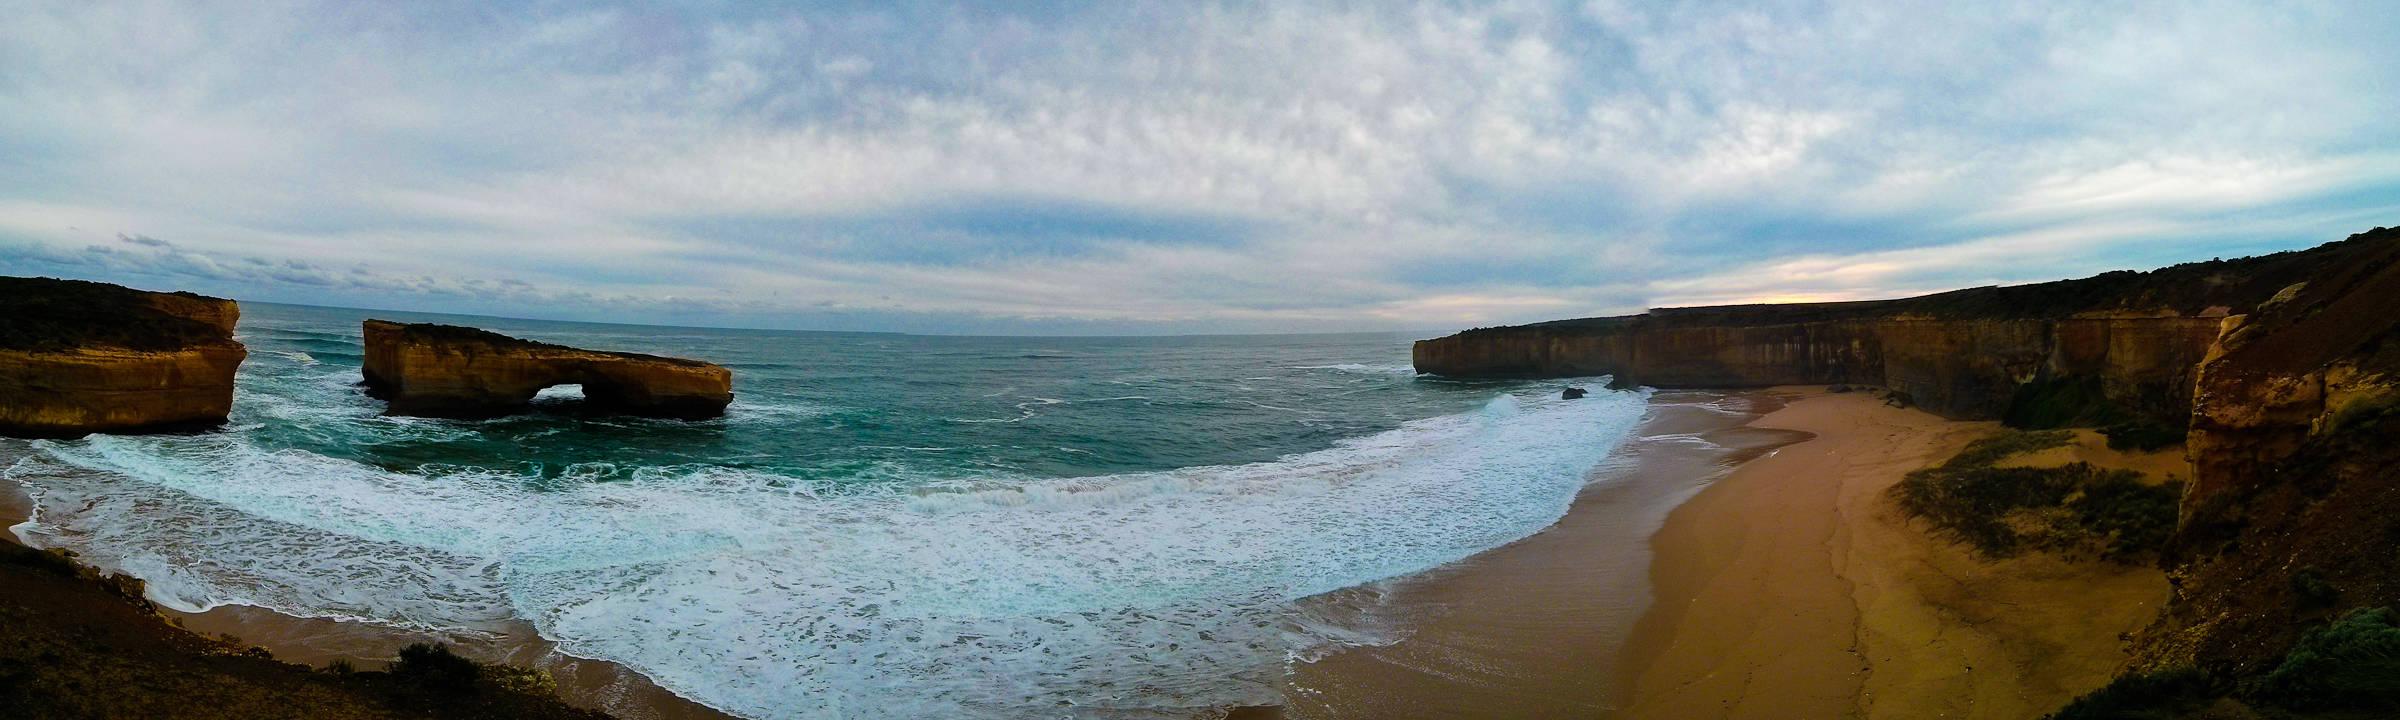 Australia: Great Ocean Road Trip